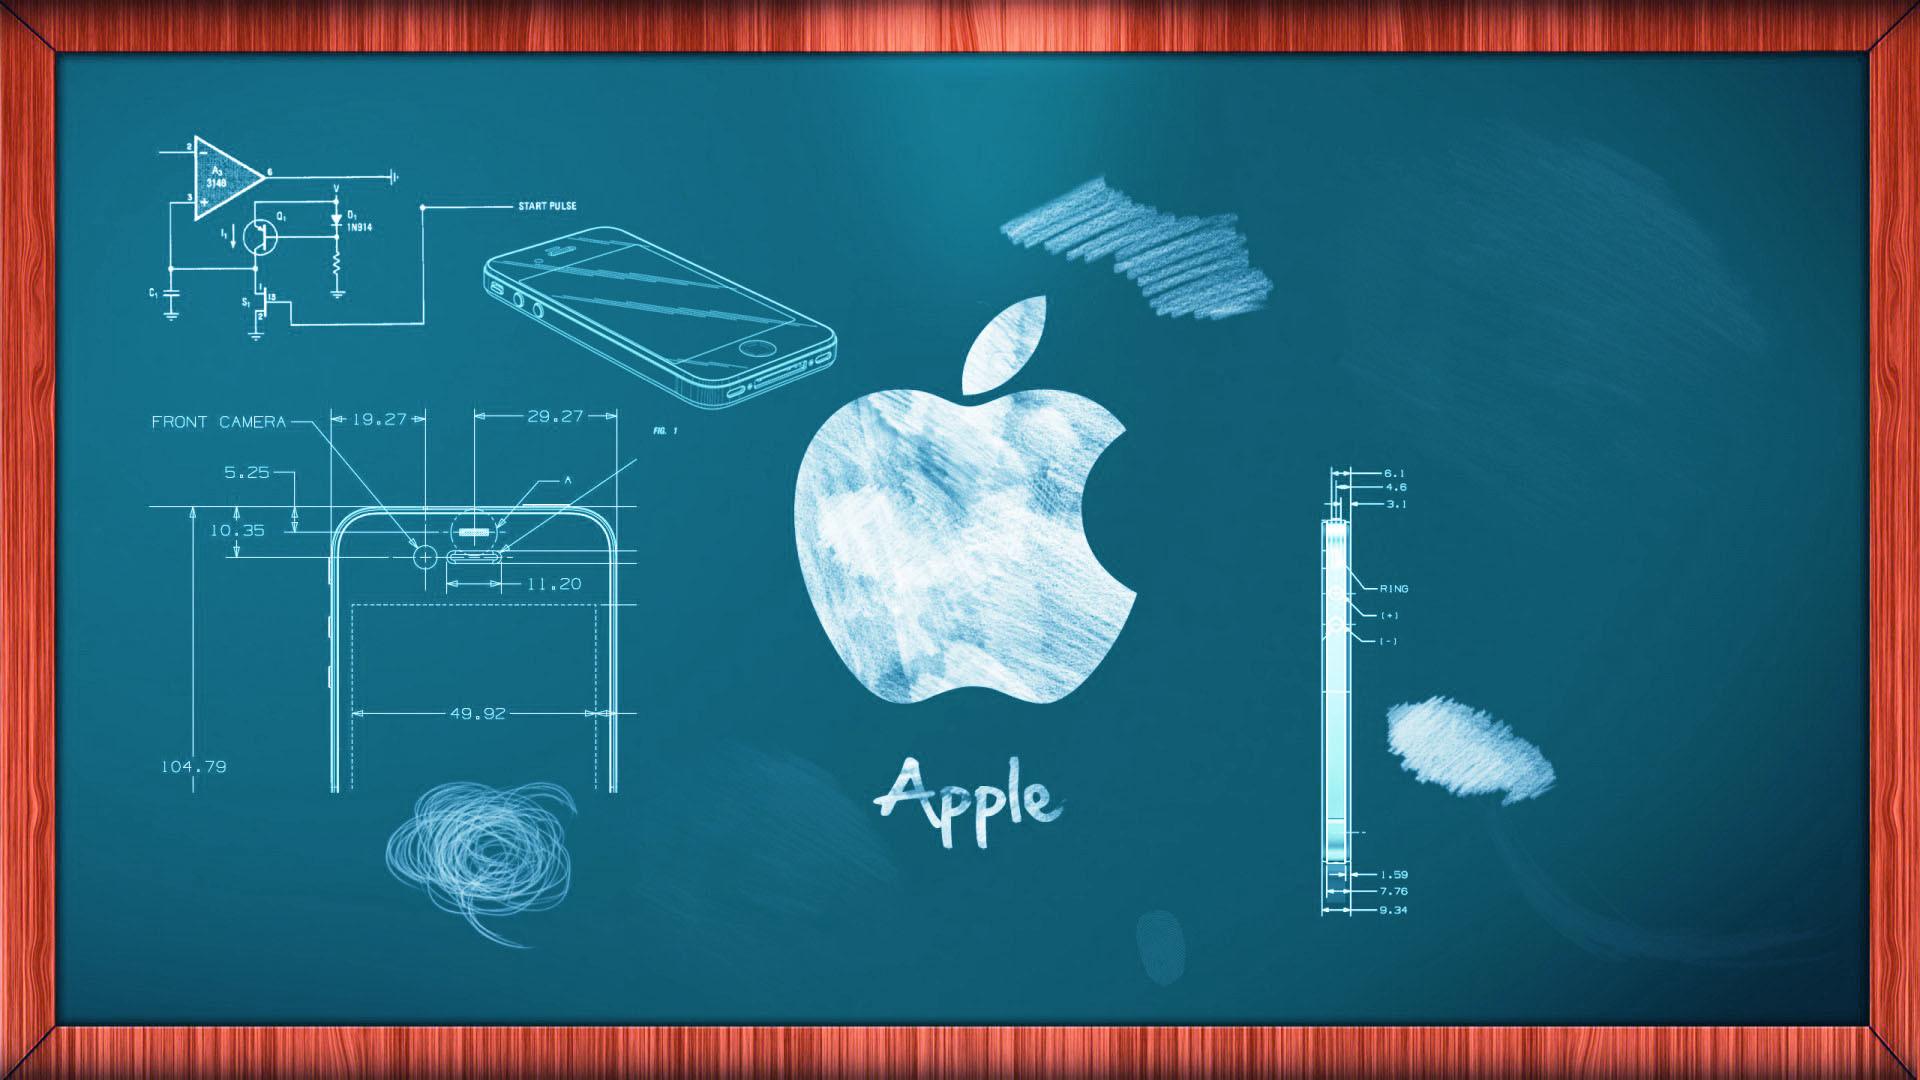 Top Mac Wallpapers Wallpapertag Images, Photos, Reviews